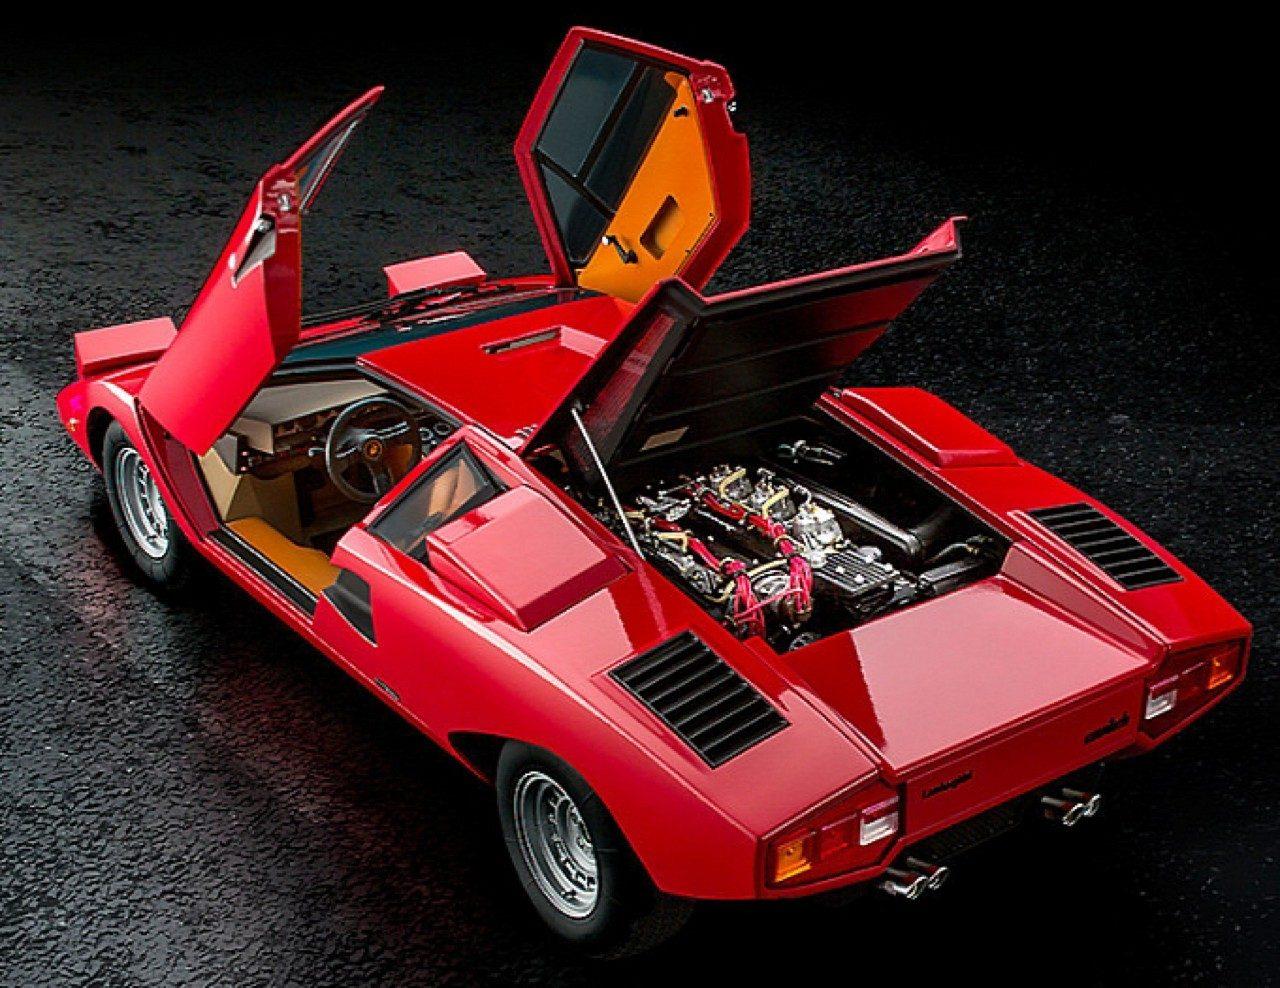 Lamborghini-Countach-miniatuur-00.jpg